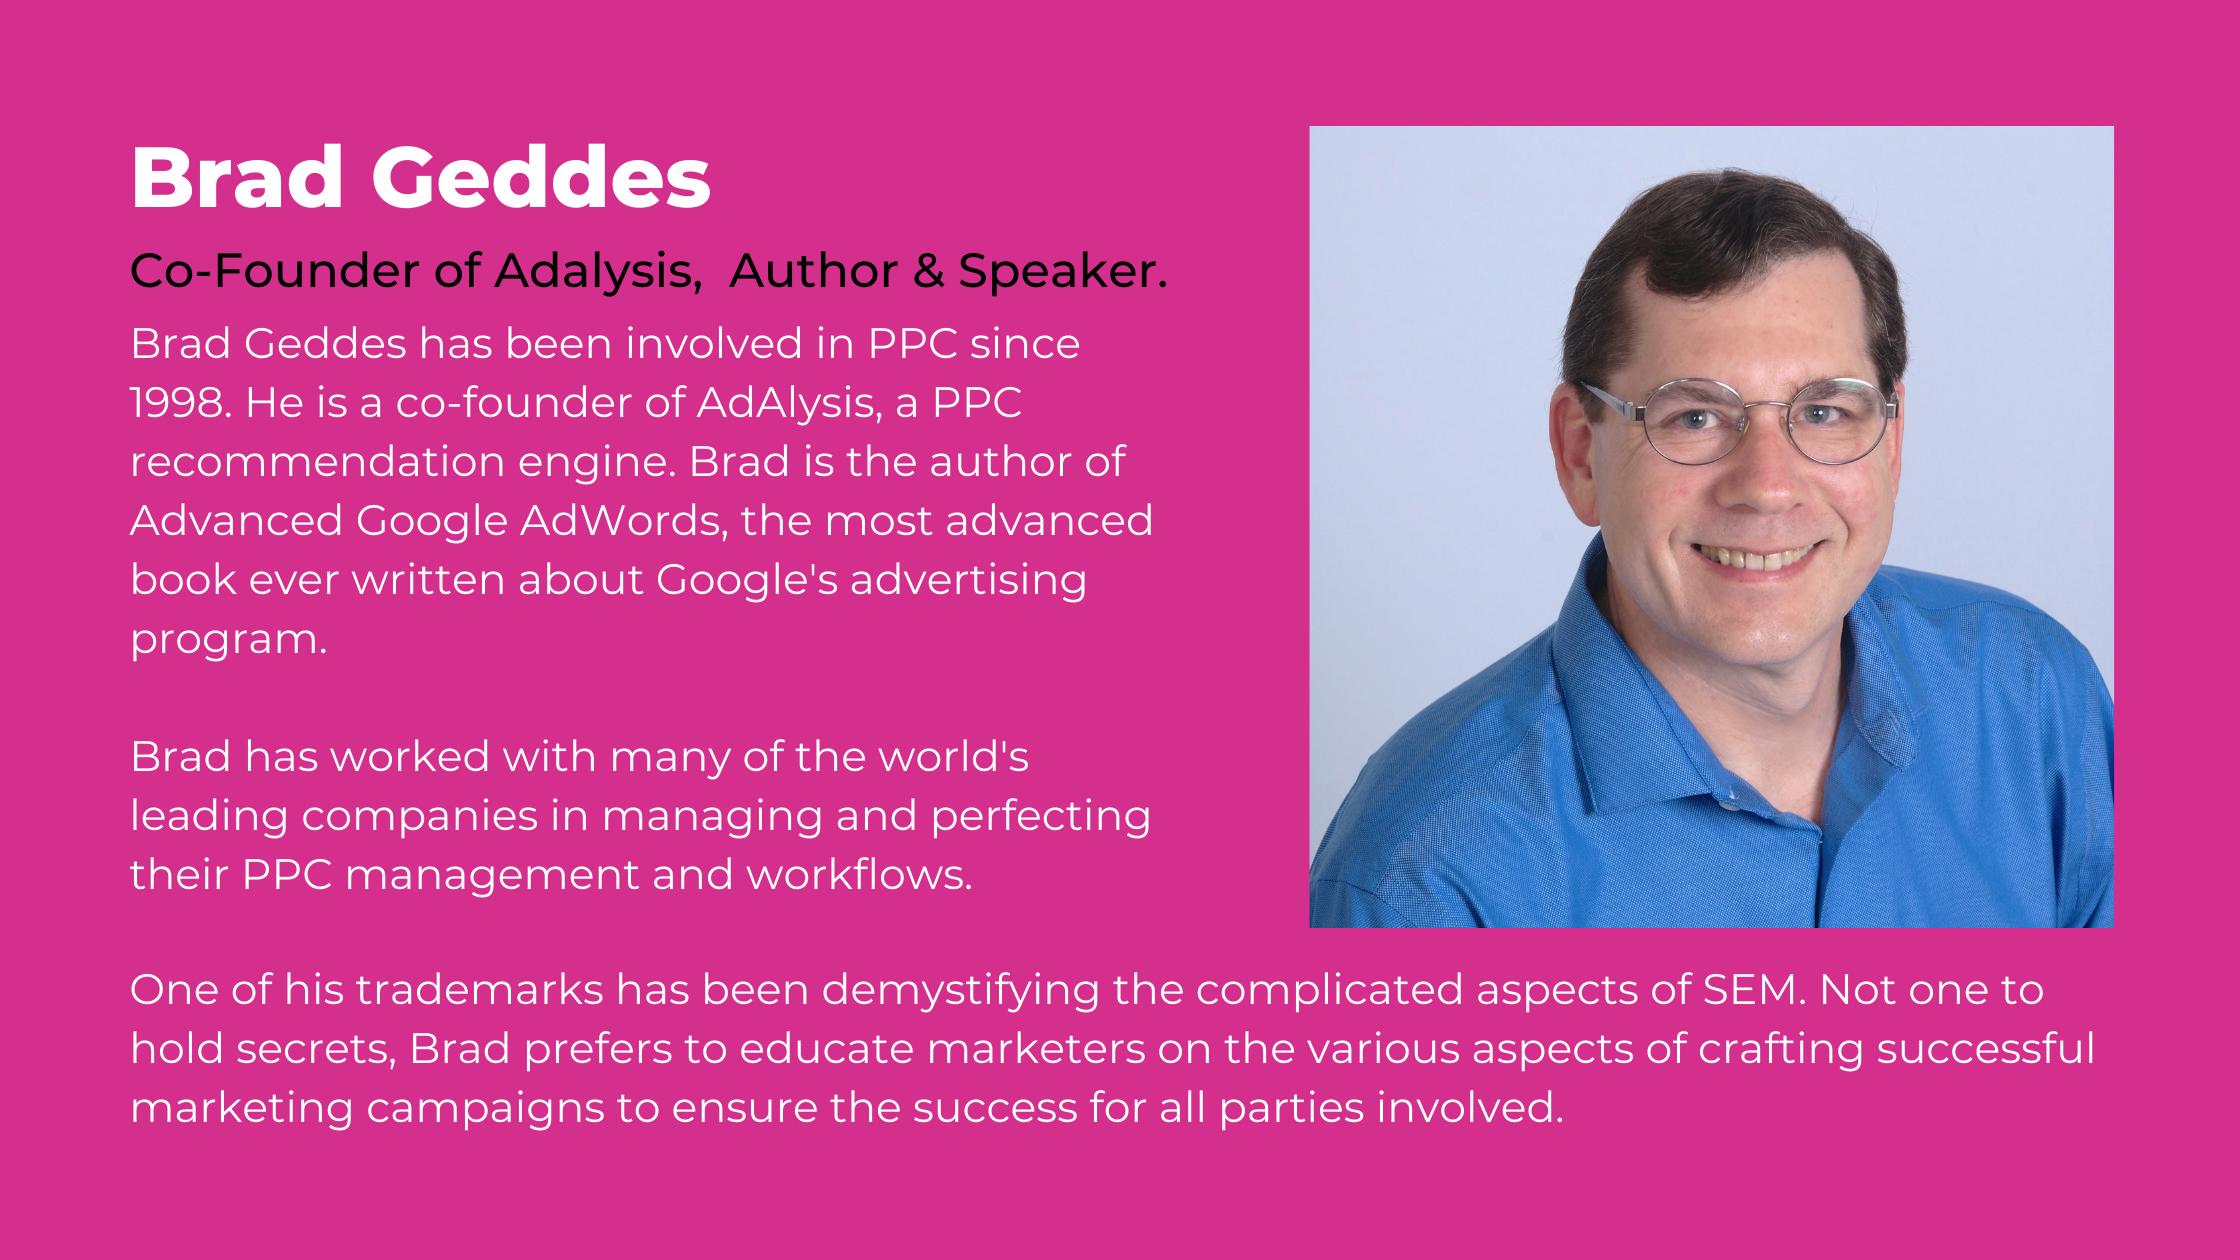 Brad Geddes inOrbit webinar speaker